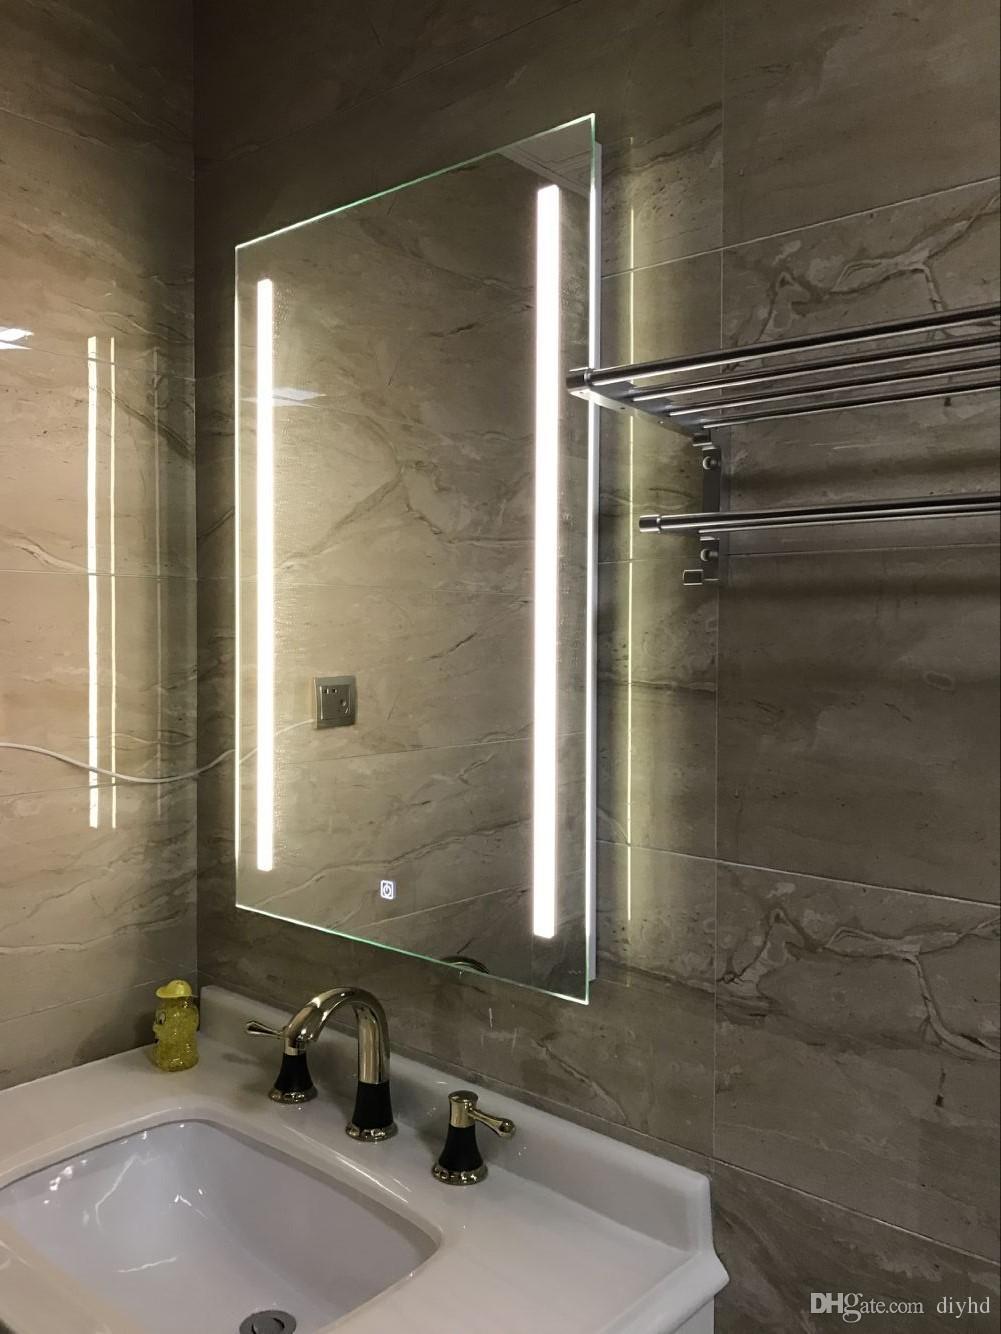 Espejos Retroiluminados Baño | Compre Diyhd Montaje En Pared Led Retroiluminado Iluminado Espejo De